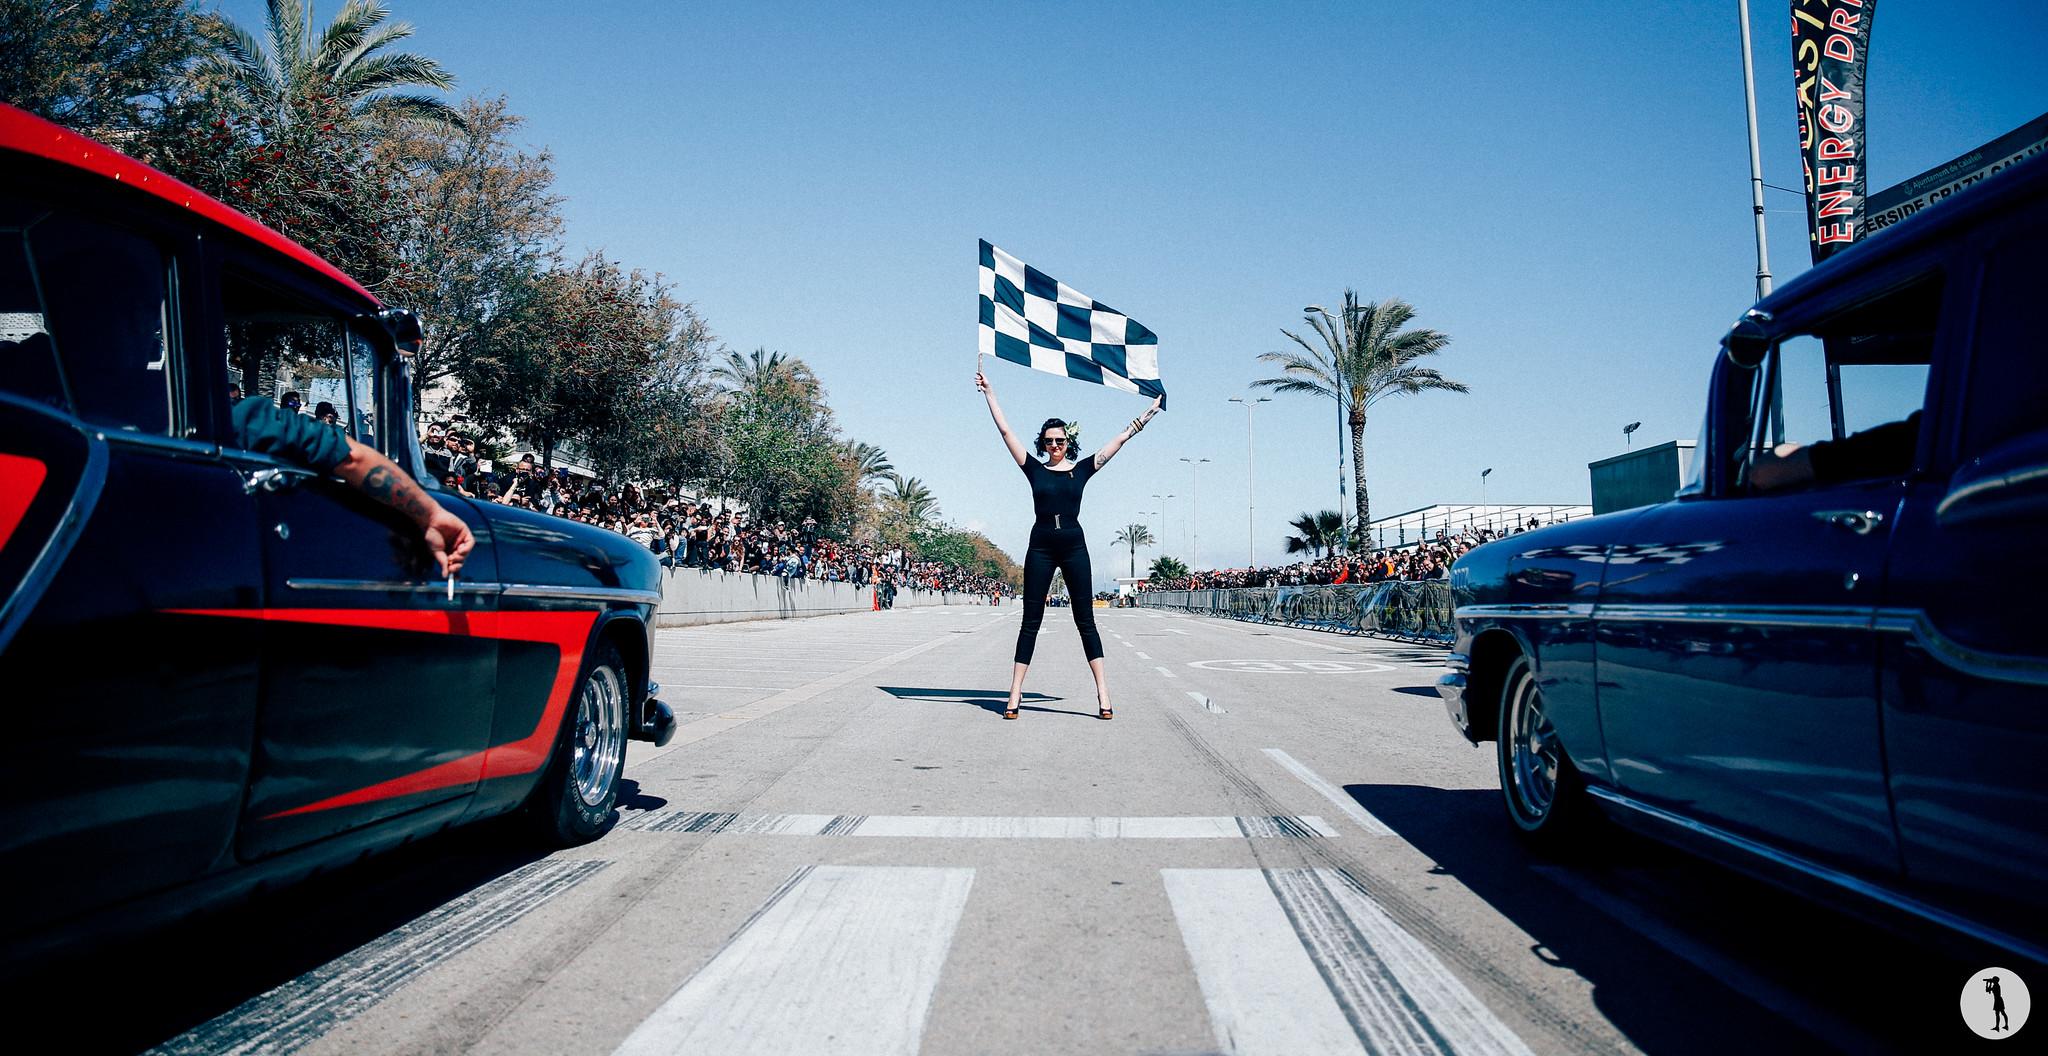 Riverside Car Show 2016, Calafell, Spain. Pin-up. Rockabilly. Flag girl.